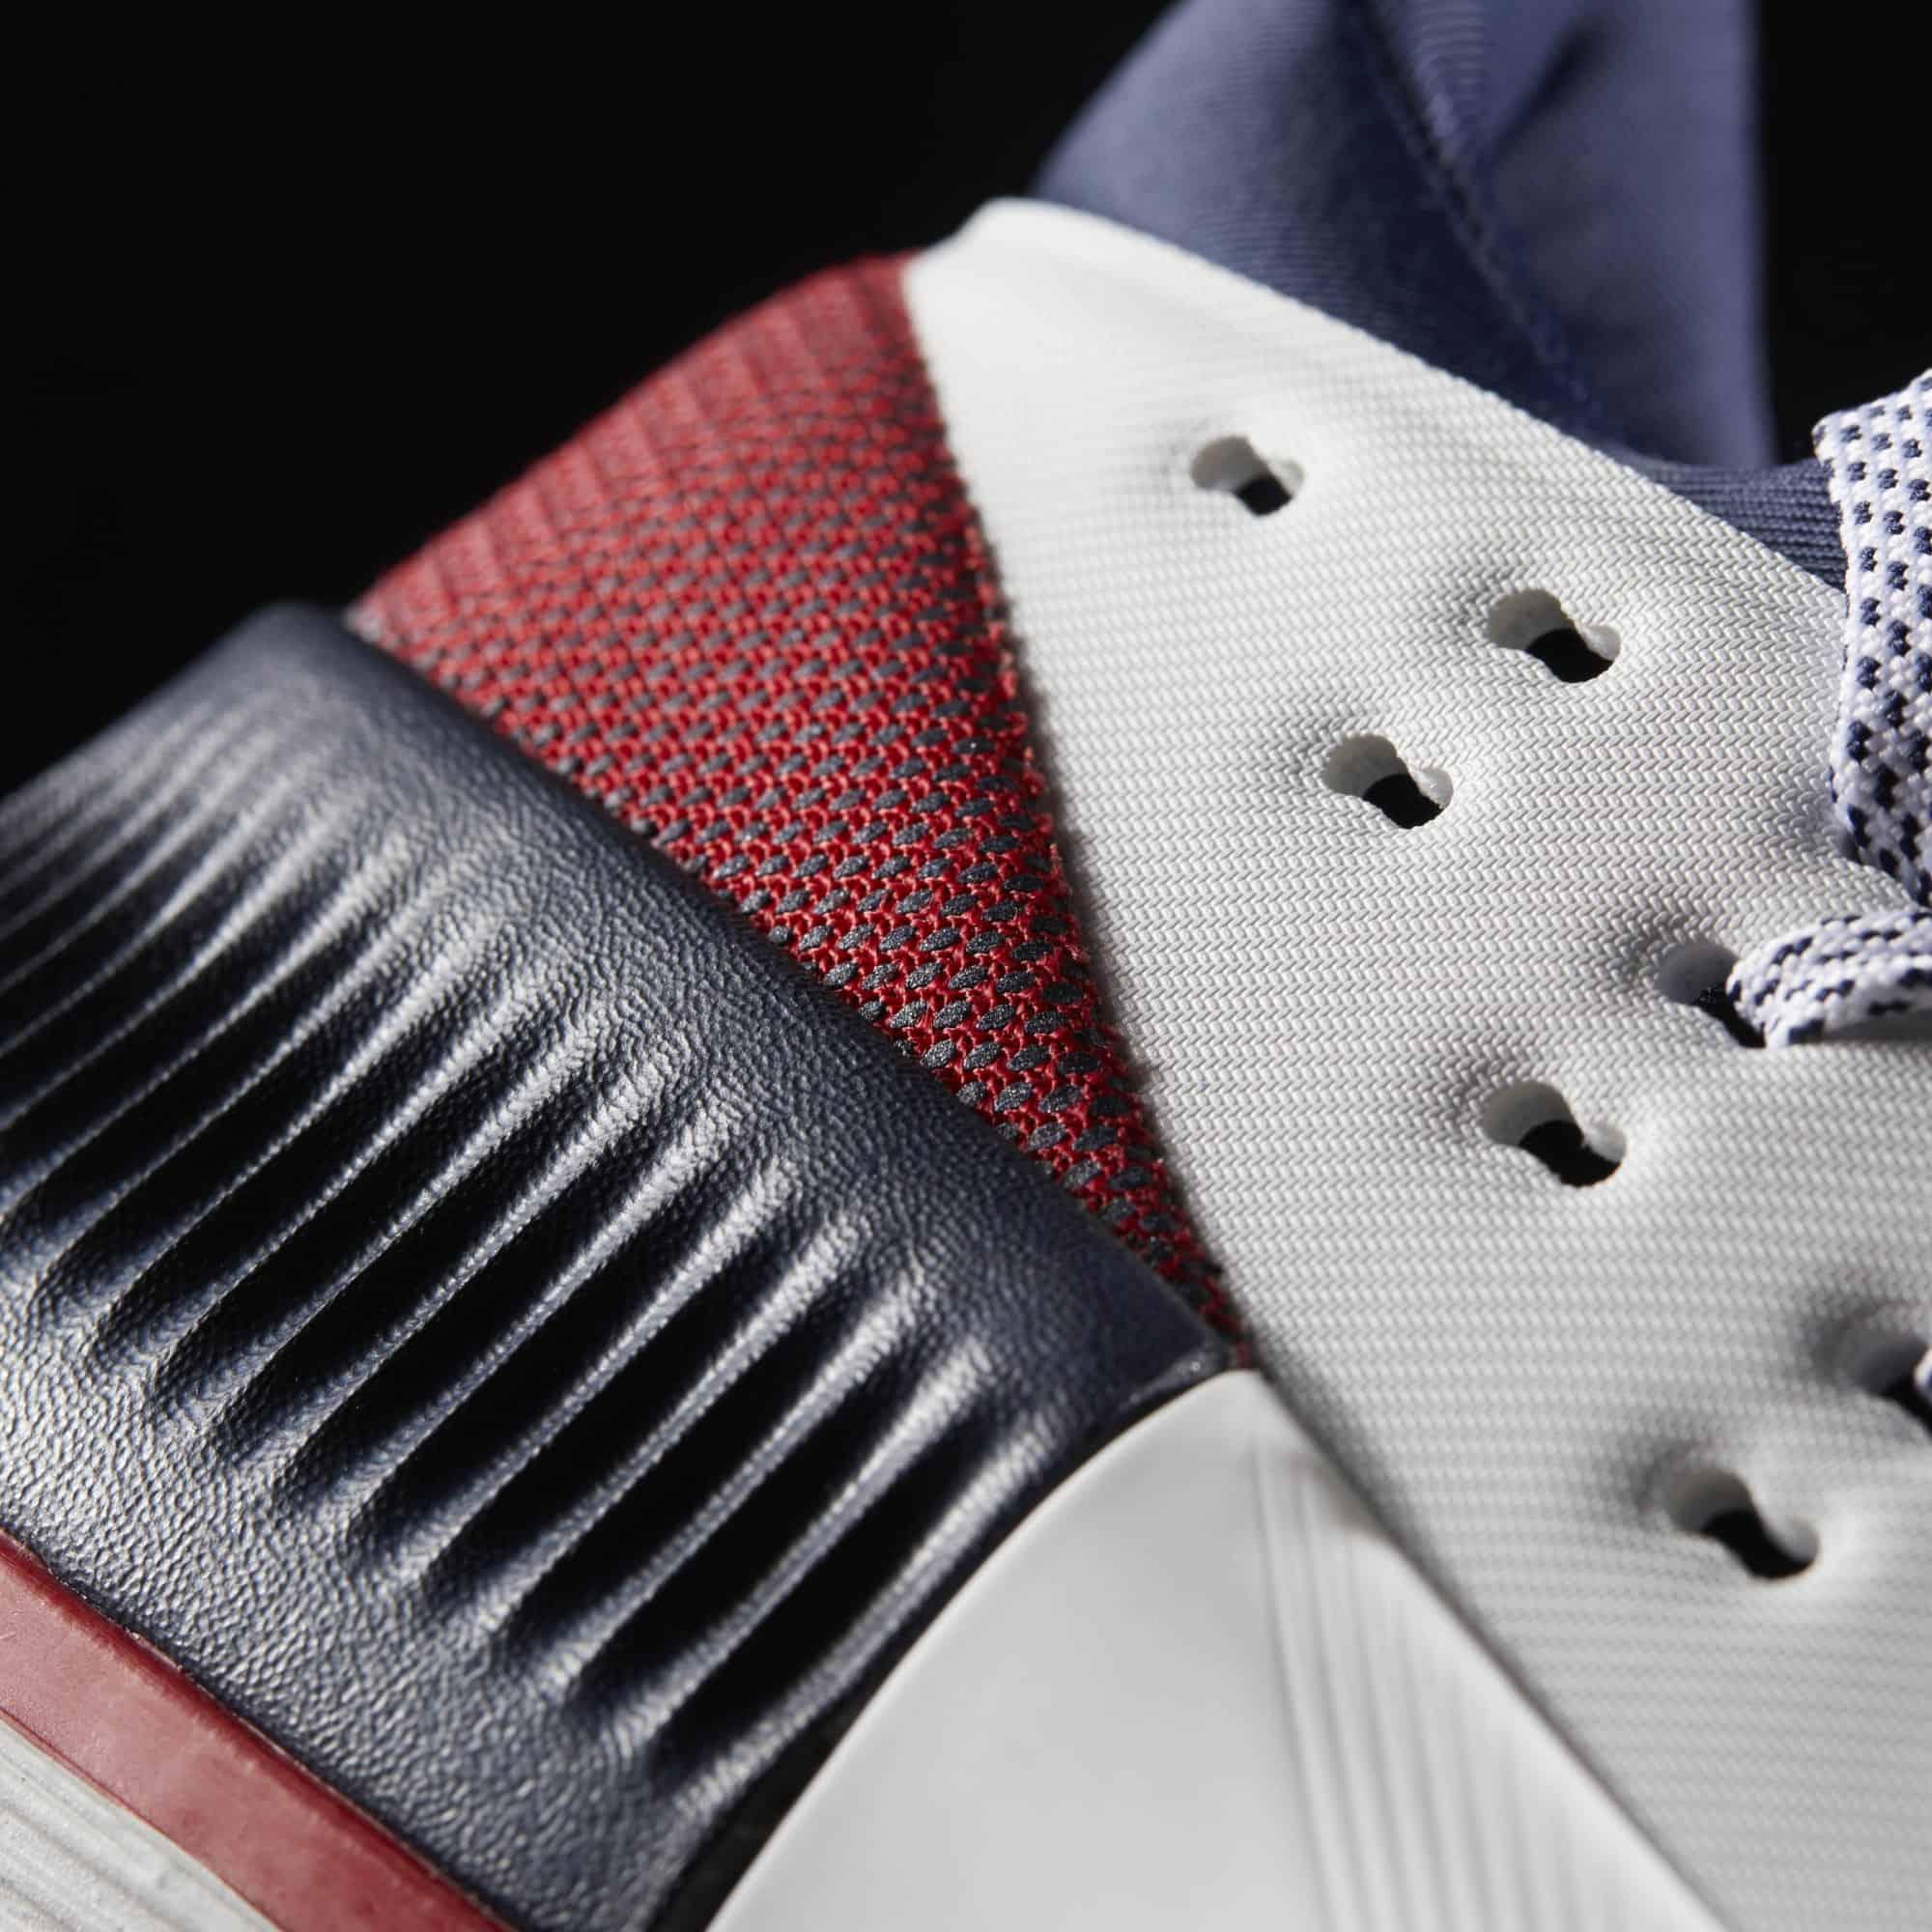 Adidas Dame 3 Review: Heel